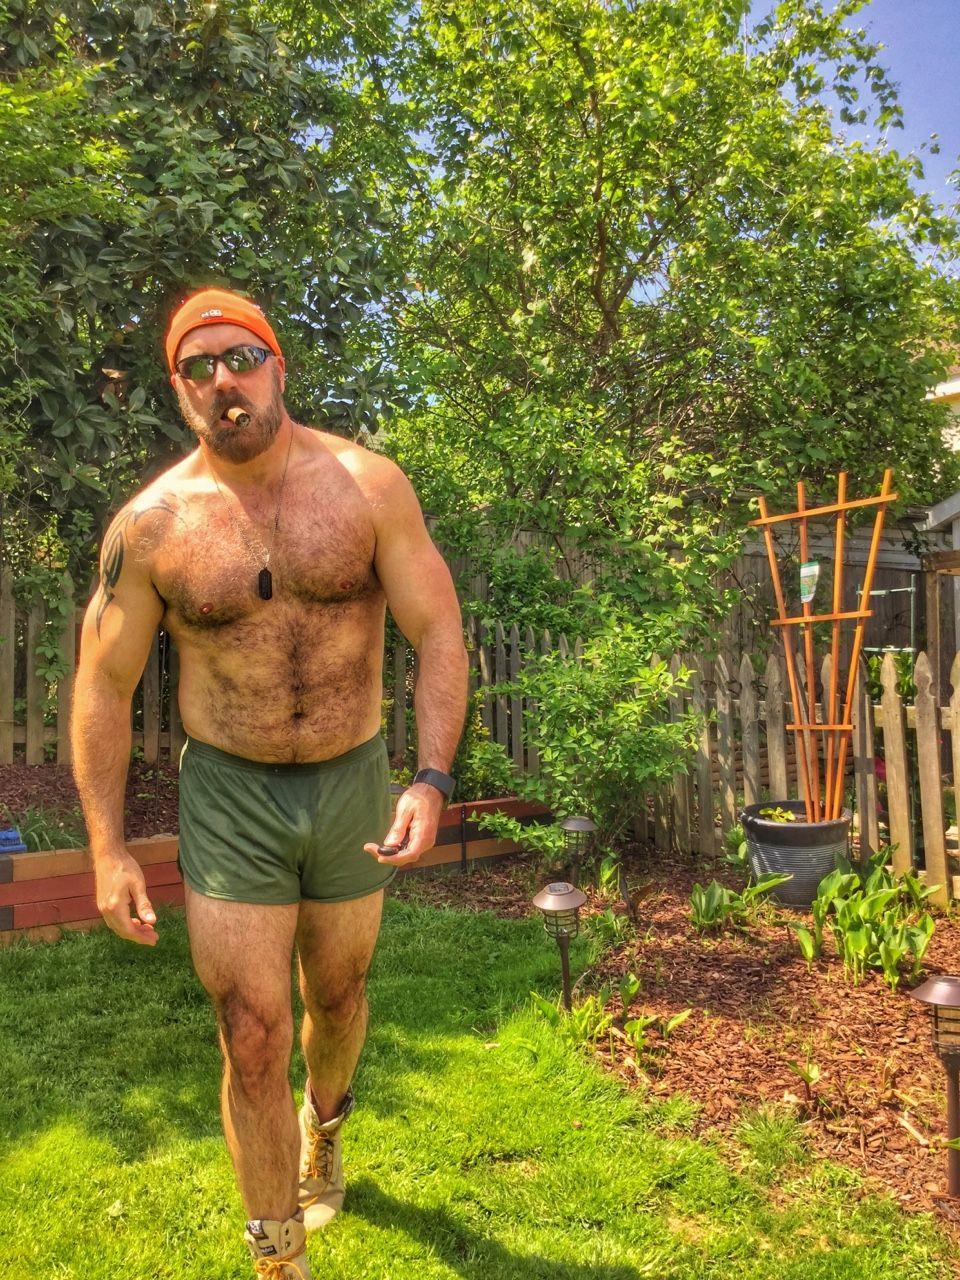 The ojays, Yards and Boys on Pinterest